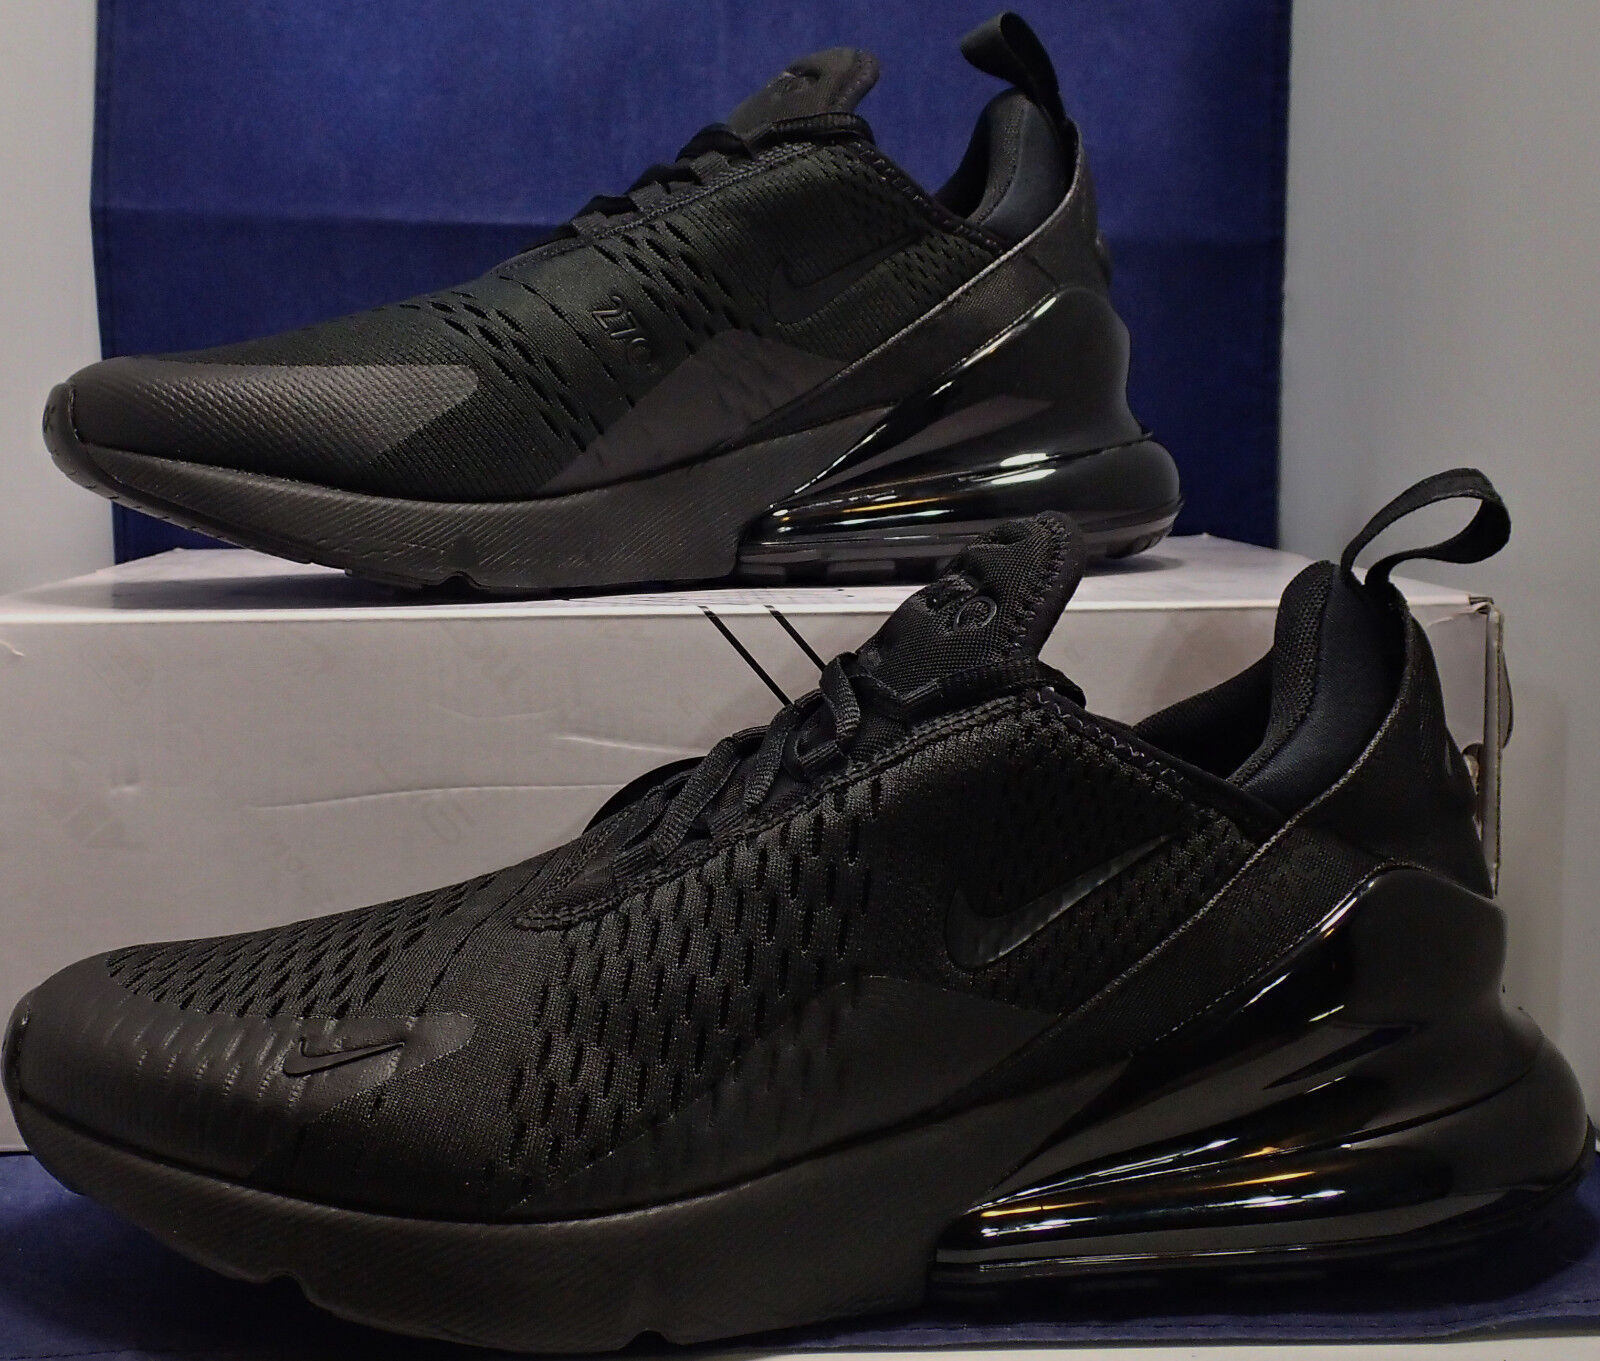 Nike Air Max 270 Schwarz Größe 11 (AH8050-005)